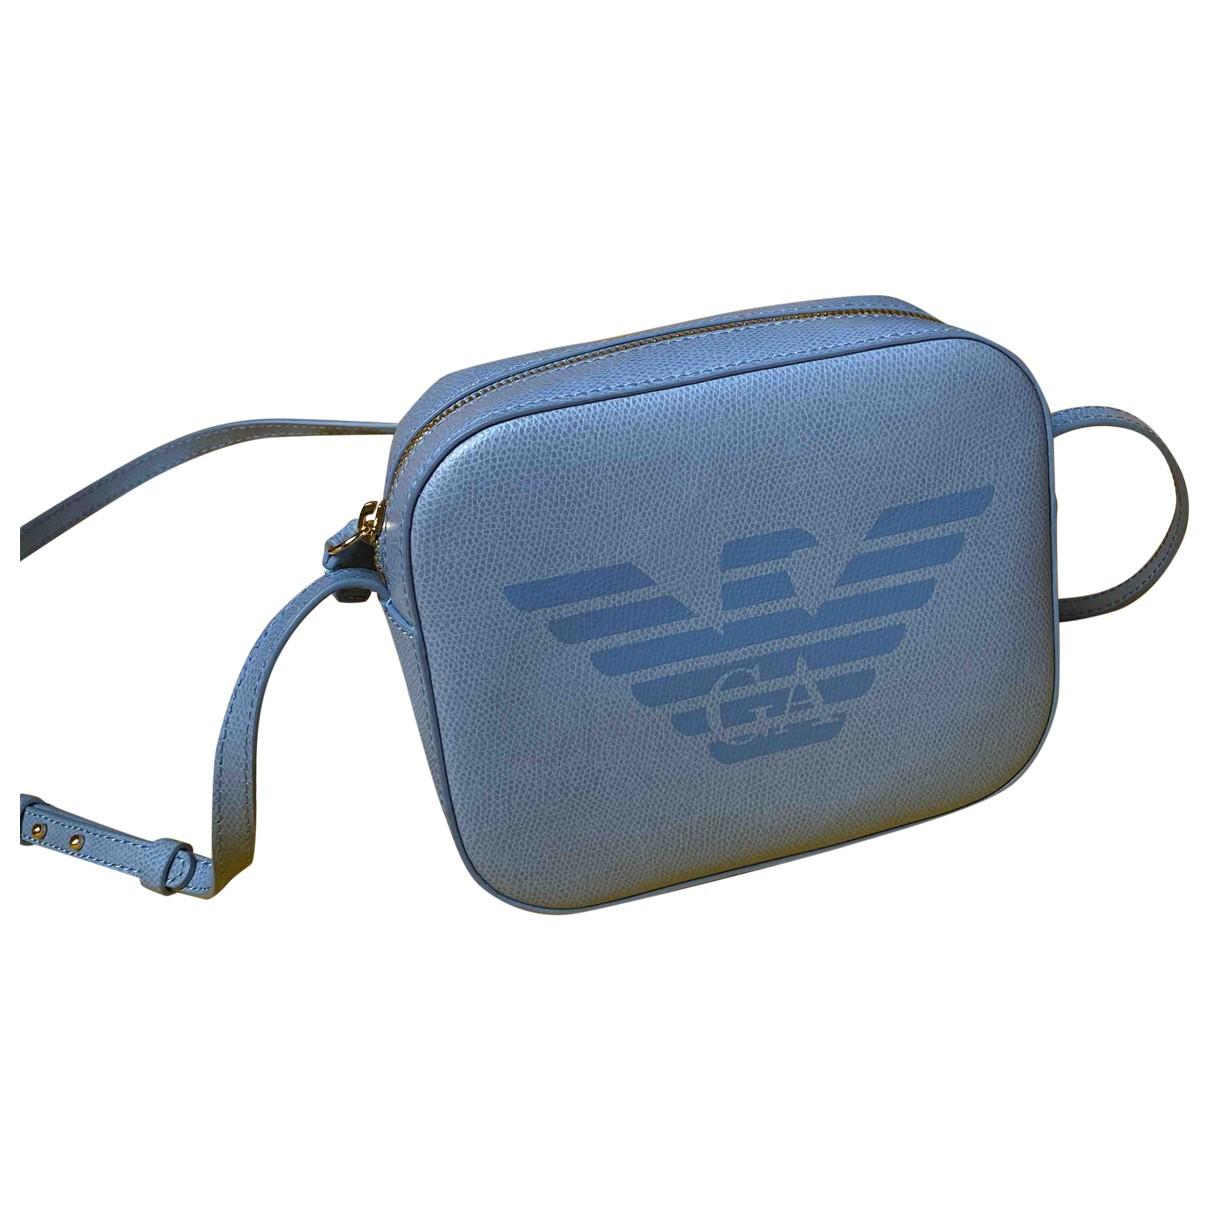 Emporio Armani \N Turquoise Leather handbag for Women \N